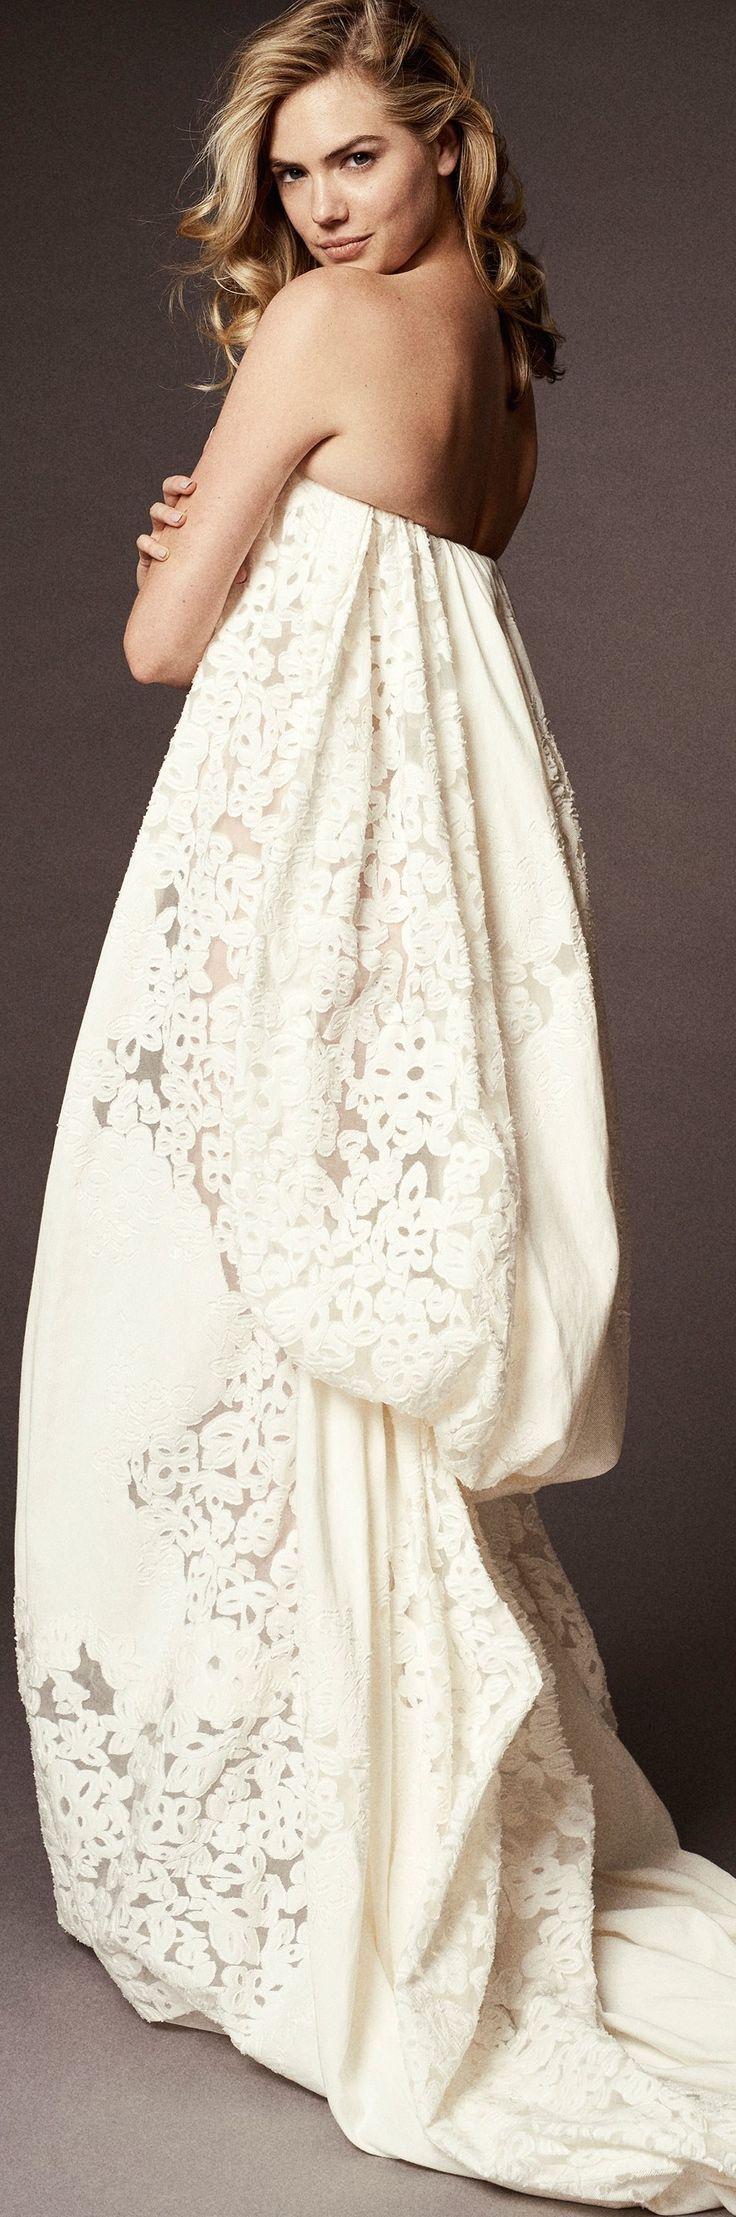 Best Elegant In Lace Images On Pinterest Lace Bridal